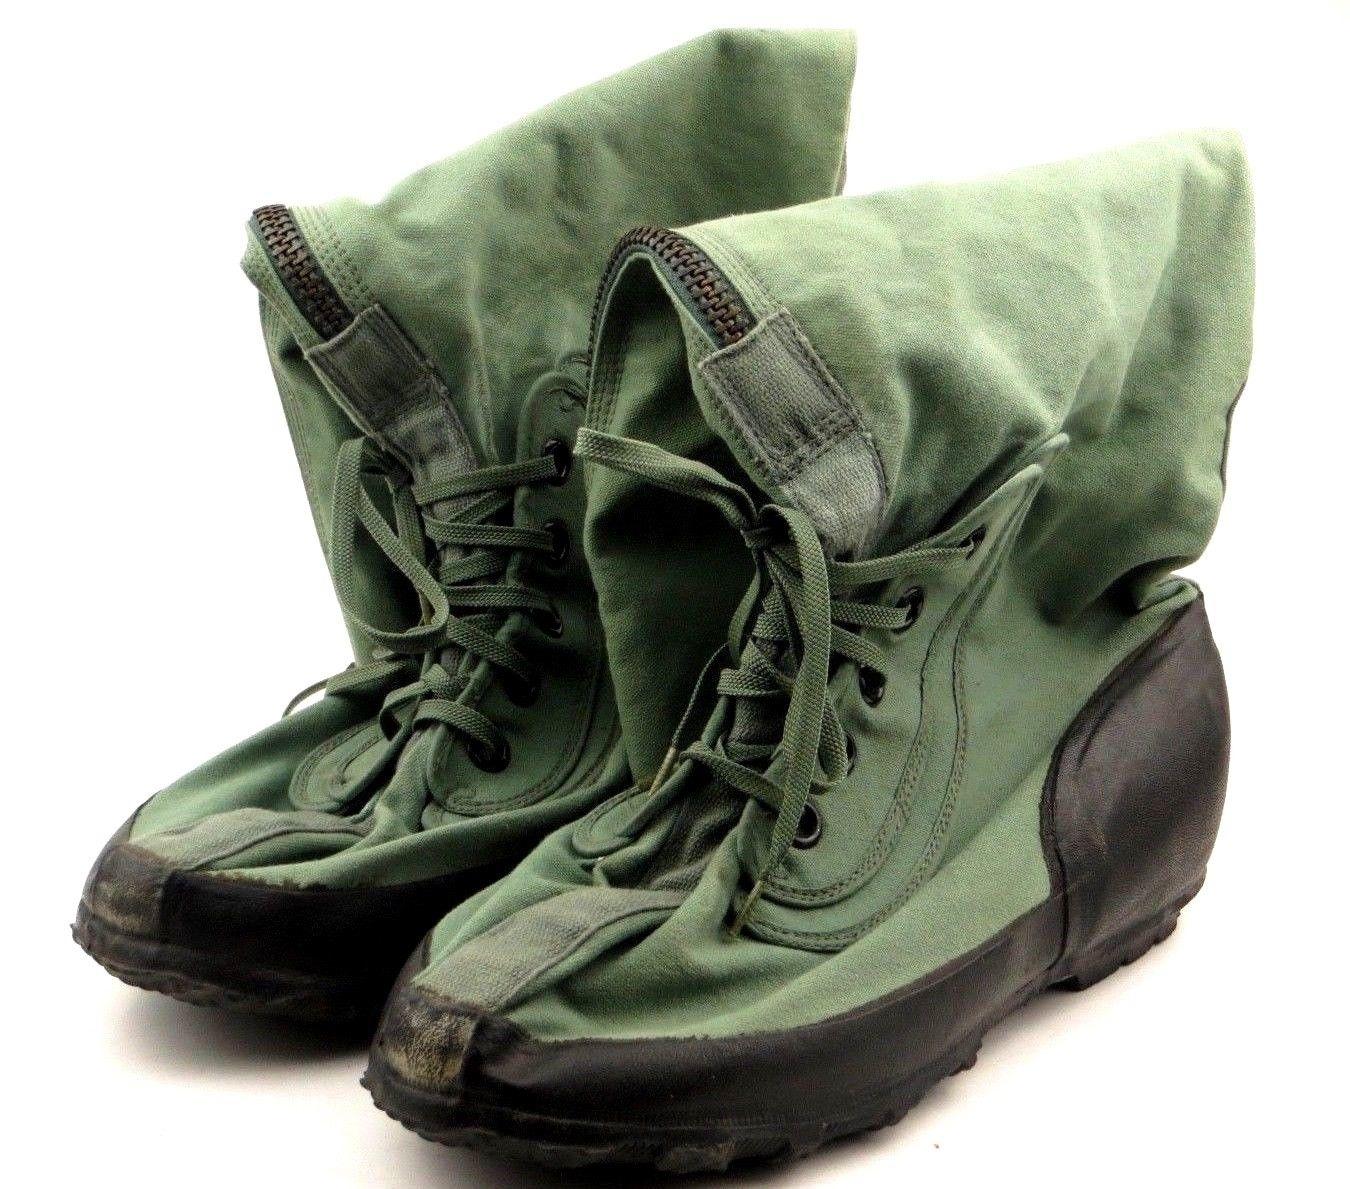 Vans Air Force Winter Boots Mukluks Retro